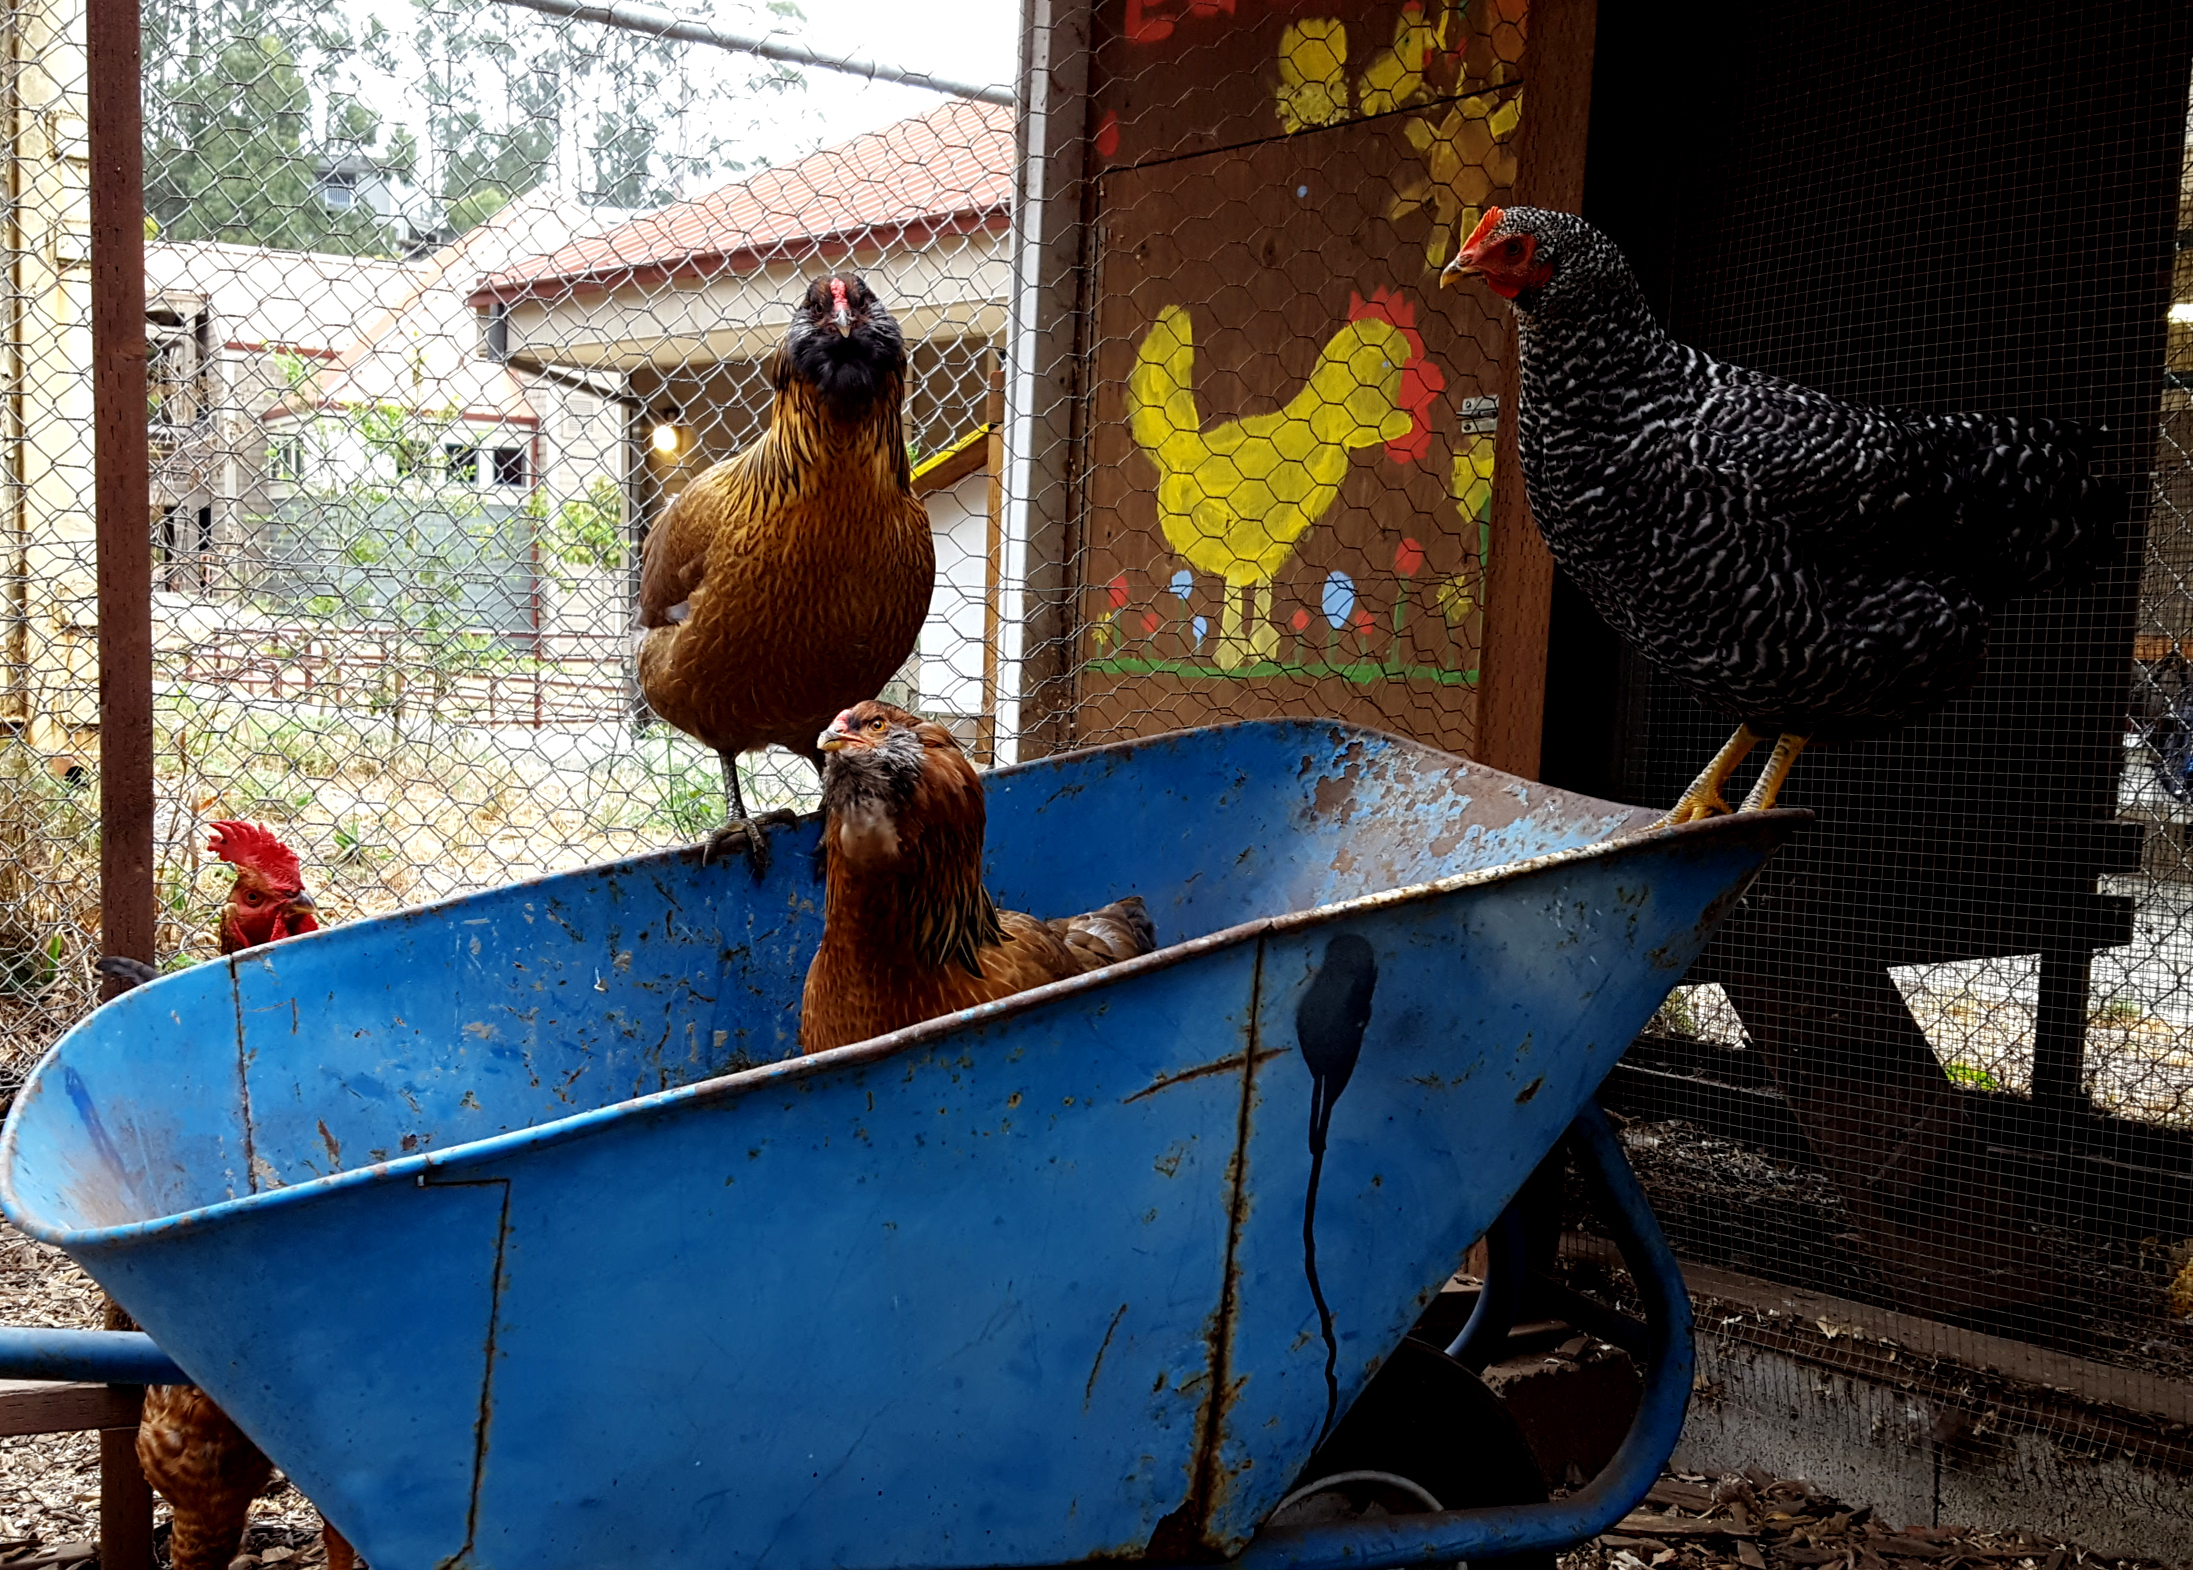 chickens_4chicks_wheelbarrow_5months_630x451